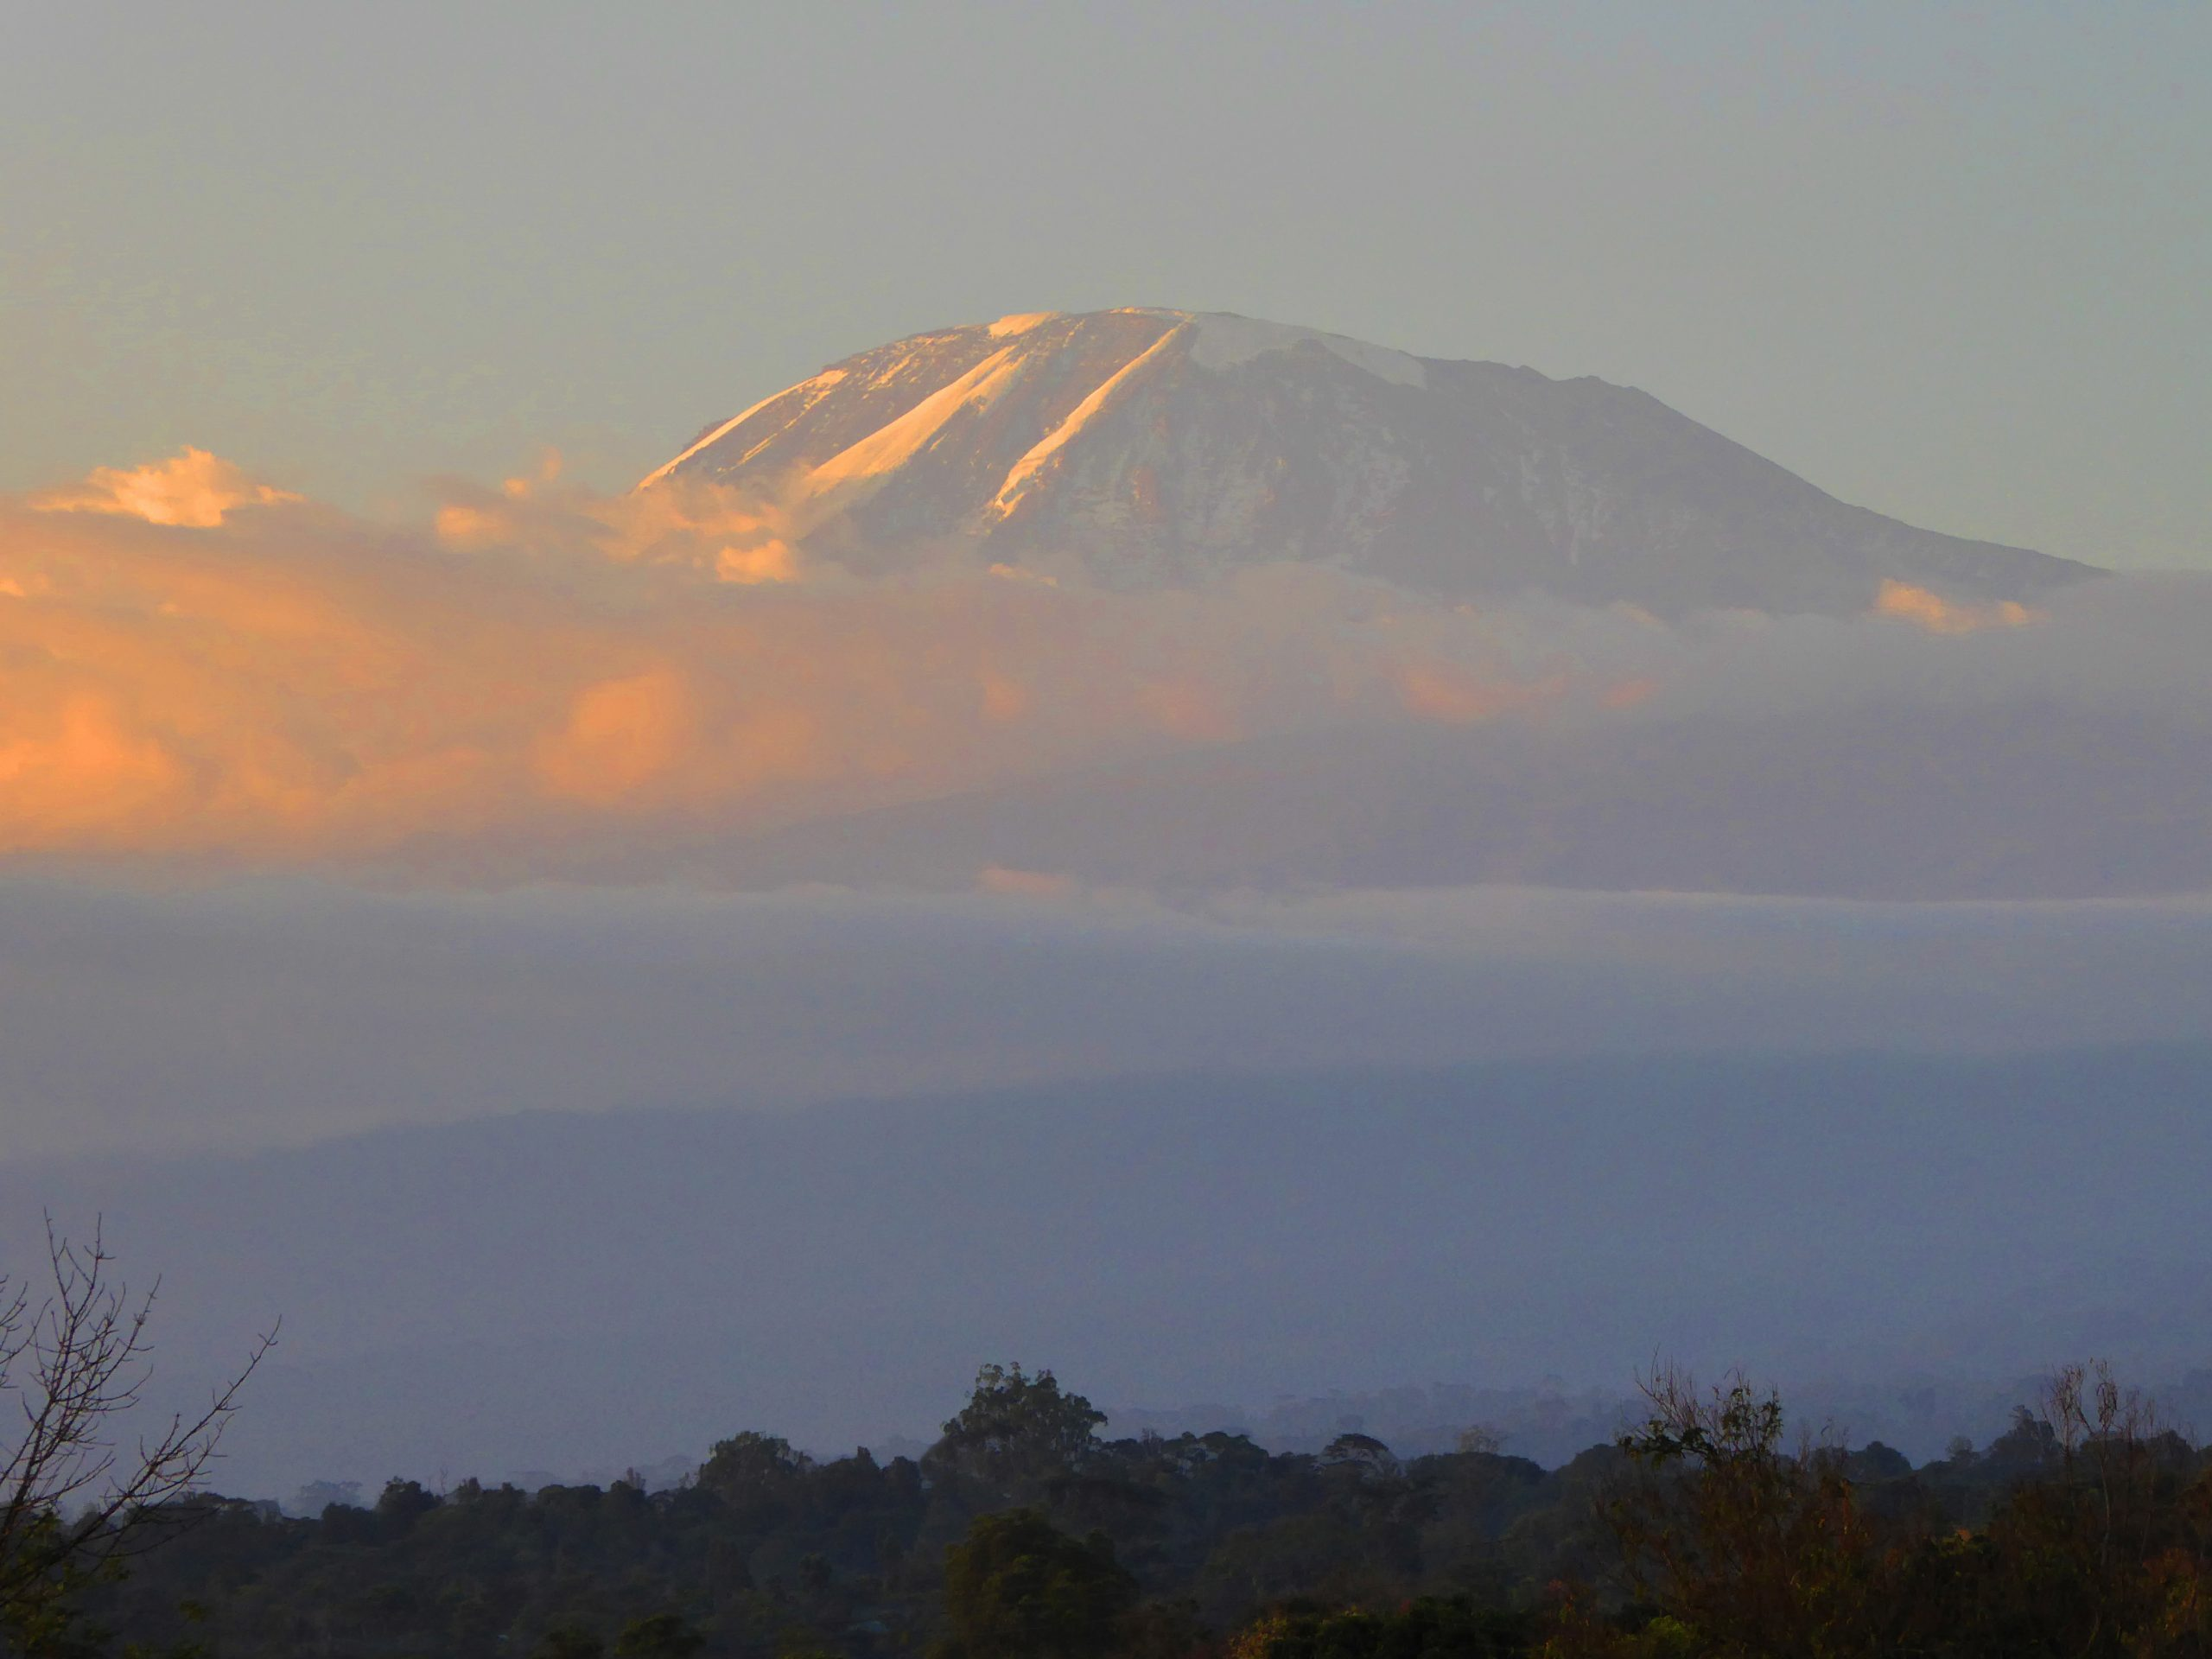 Radreise Afrika 2014 - Kilimanjaro - Sonnenuntergang